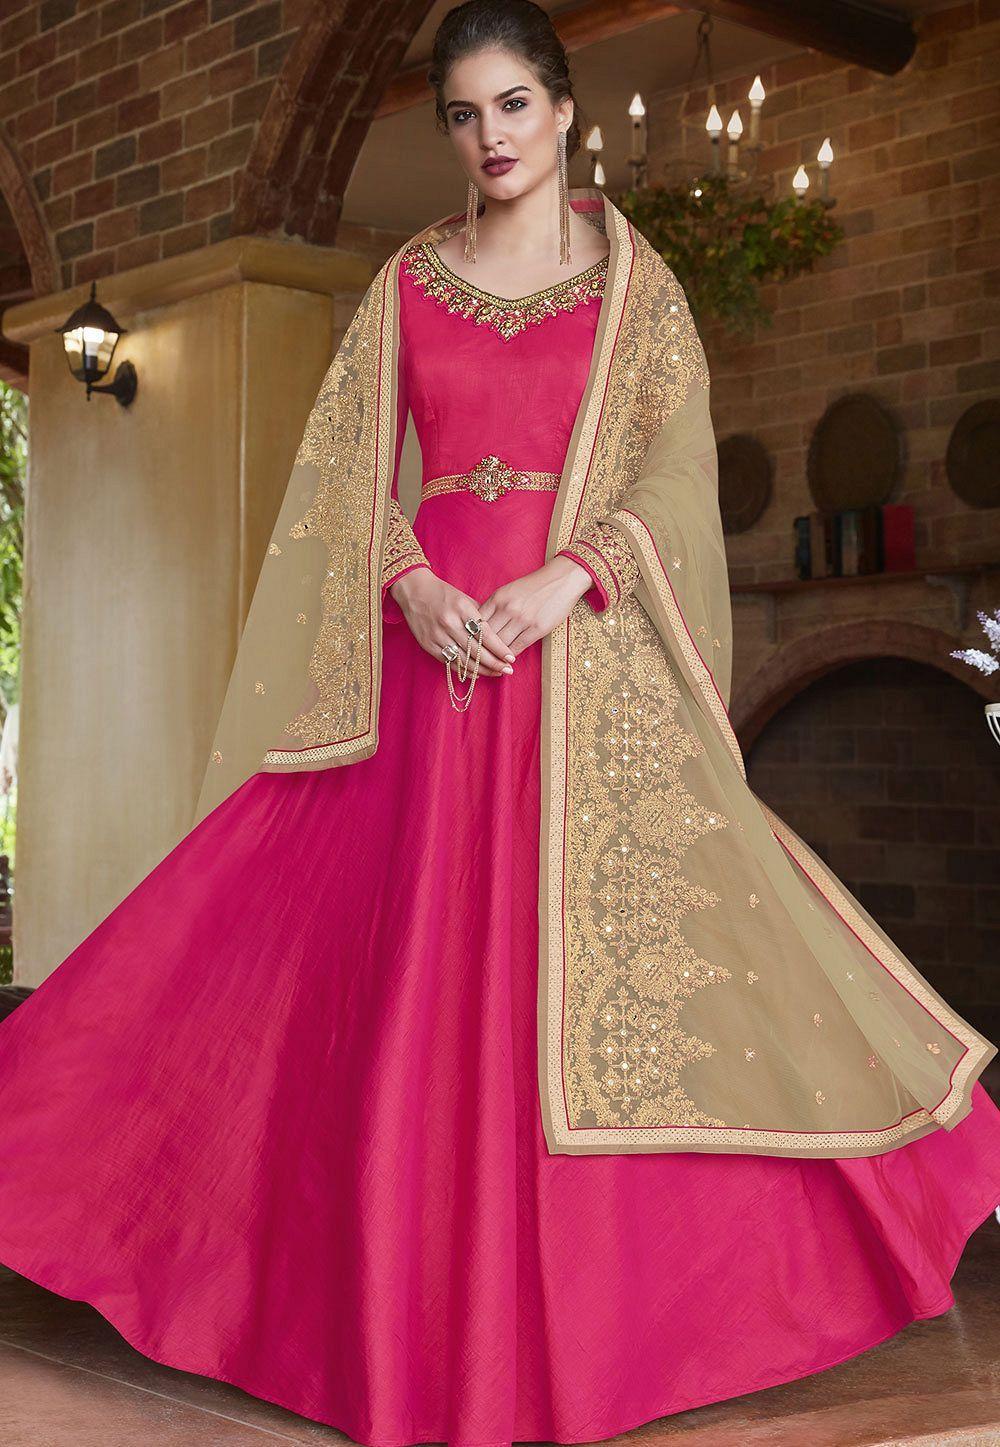 806119fc44 Rani banarasi silk Indian wedding wear anarkali suit 4507 | Party ...